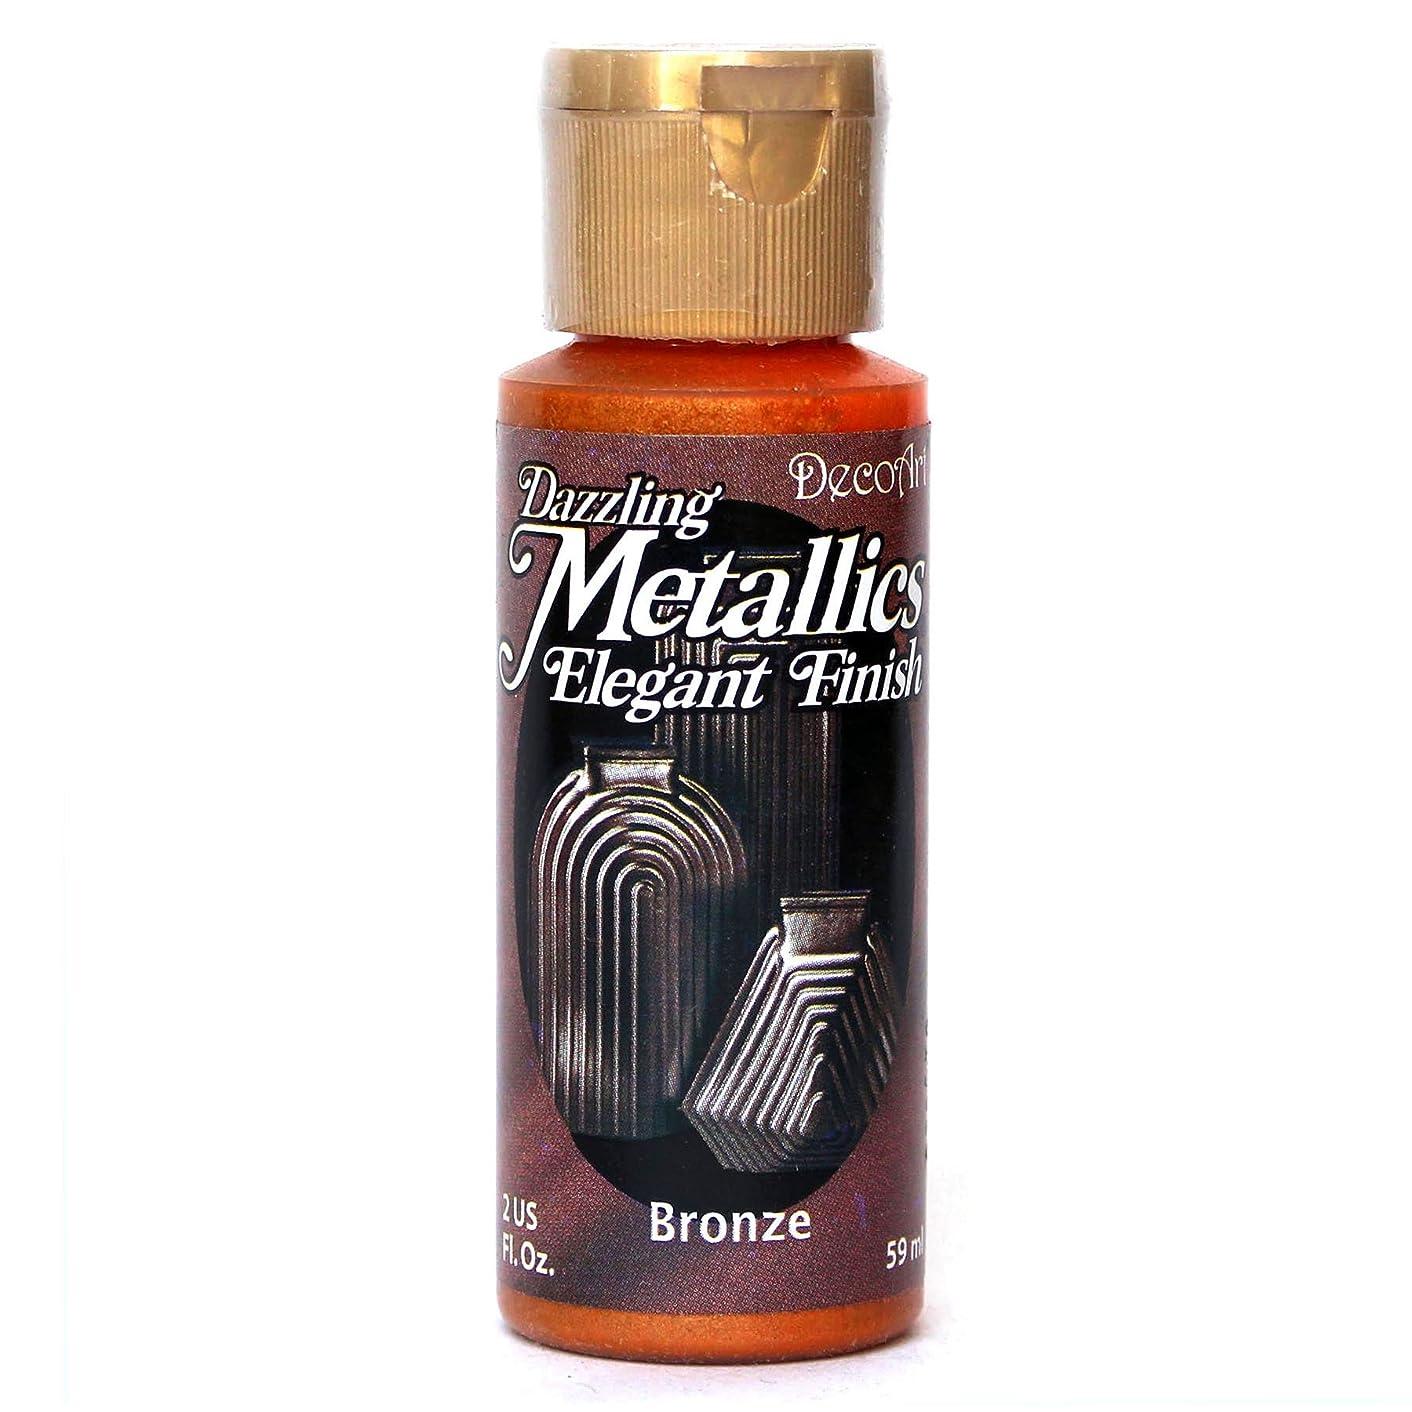 DecoArt Dazzling Metallics 2-Ounce Bronze Acrylic Paint